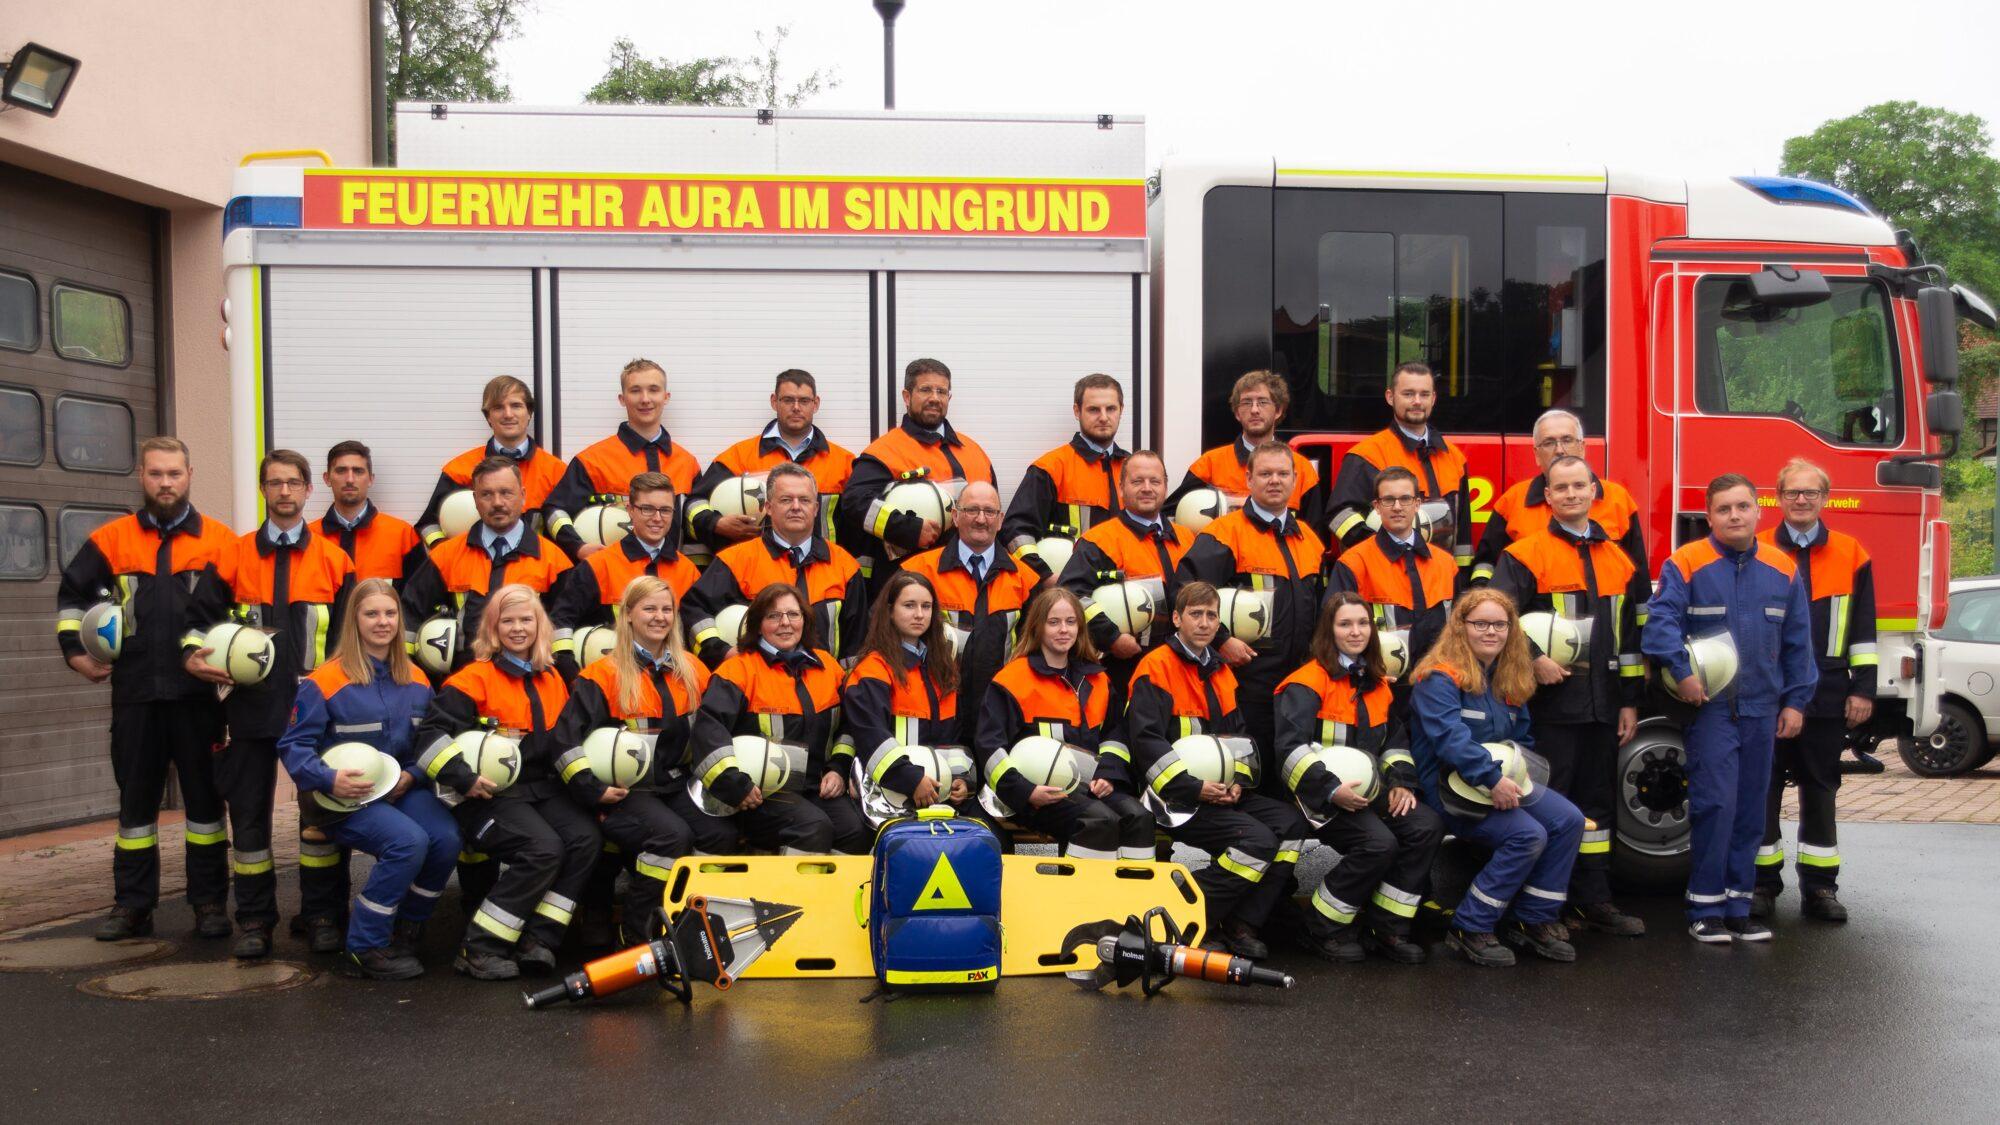 Freiwillige Feuerwehr Aura e. V.